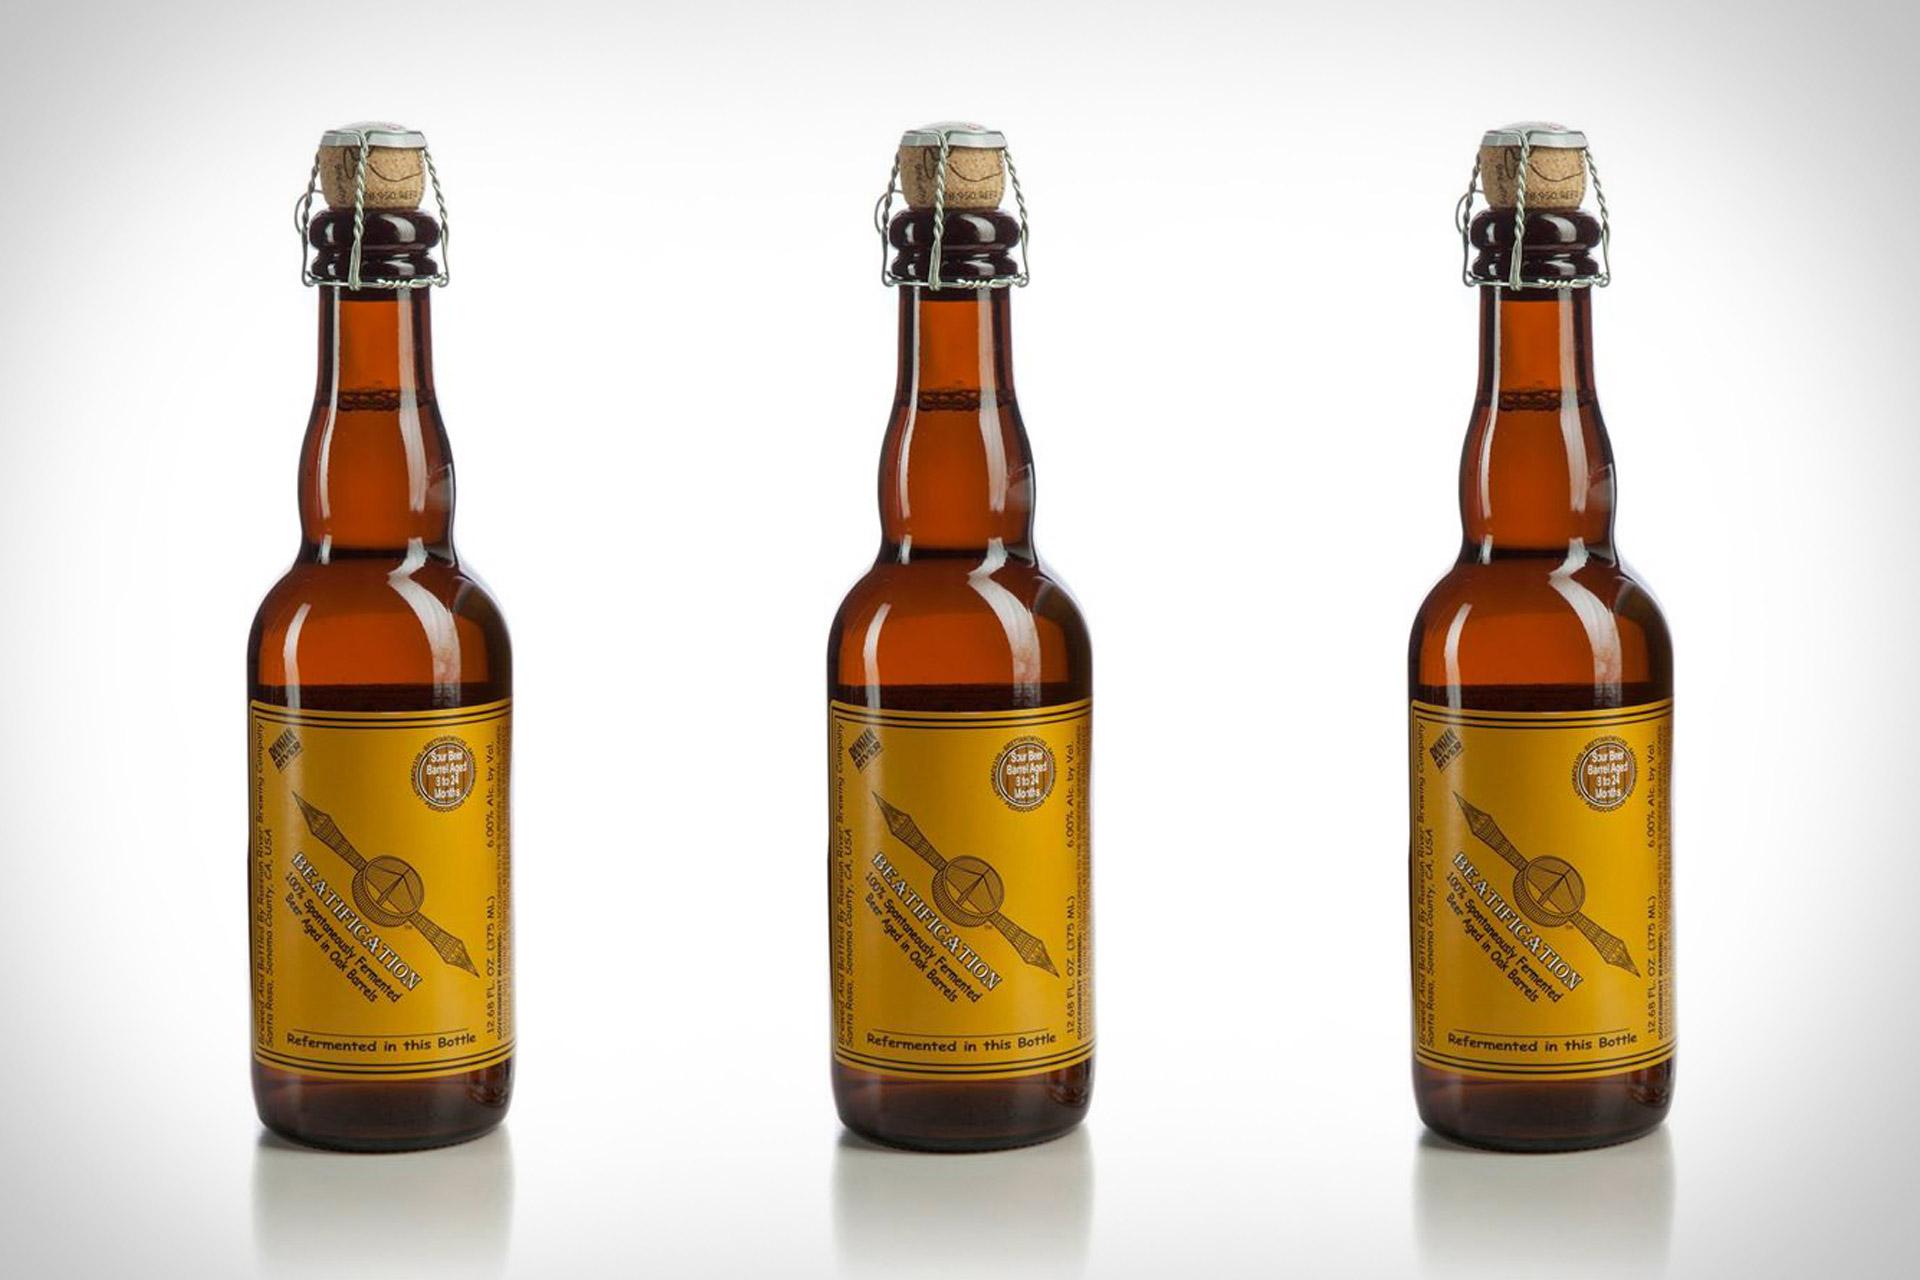 Russian River Beatification Beer